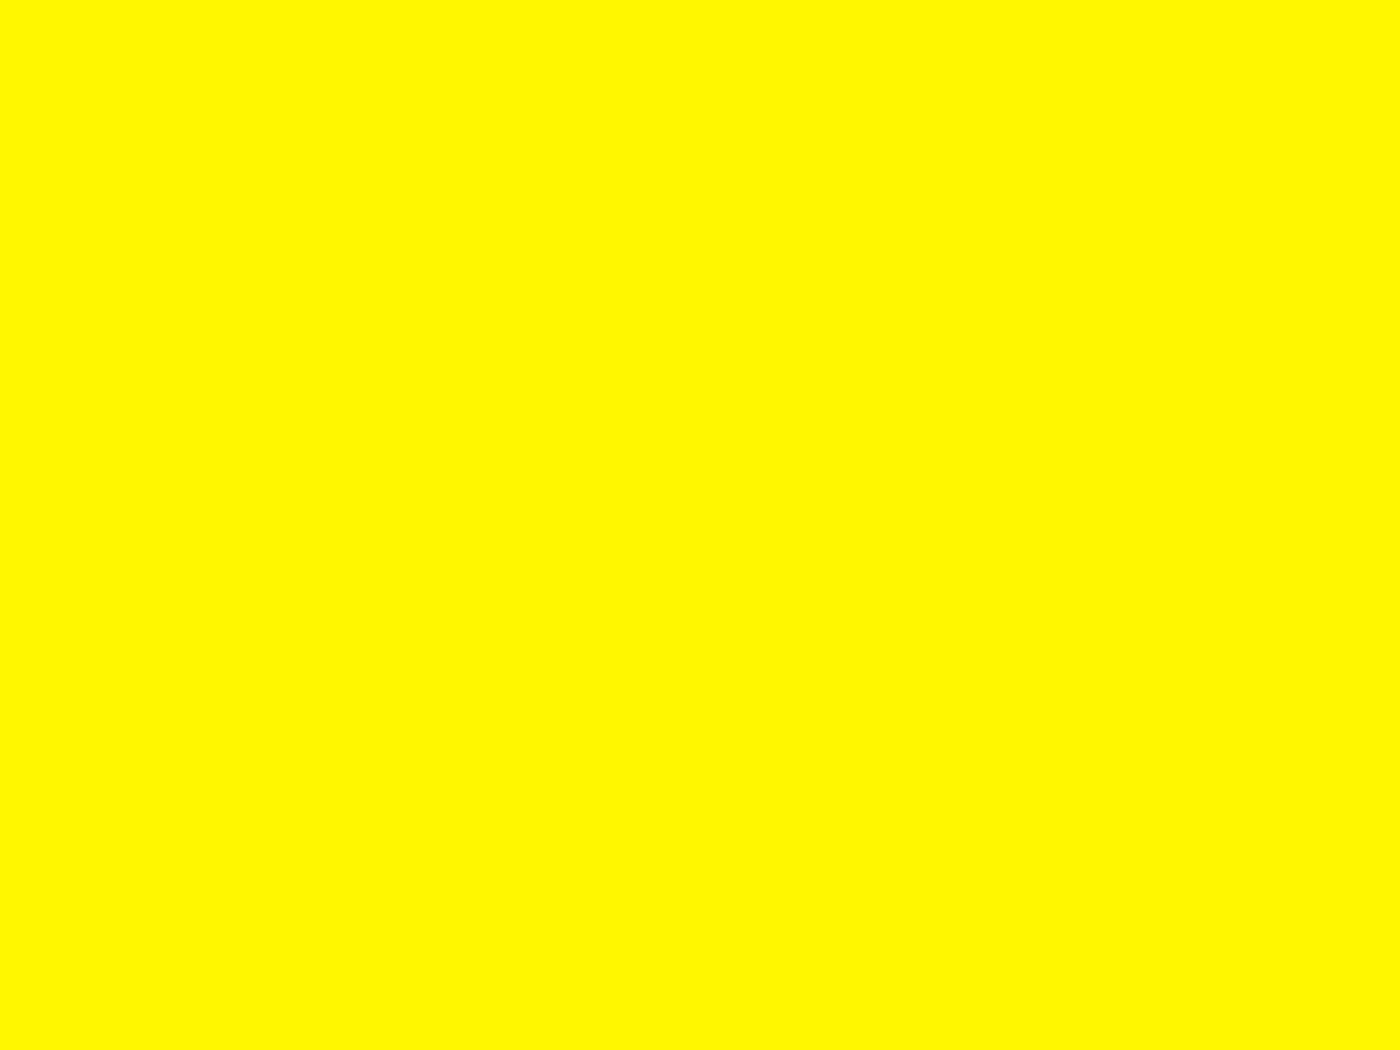 1400x1050 Lemon Solid Color Background